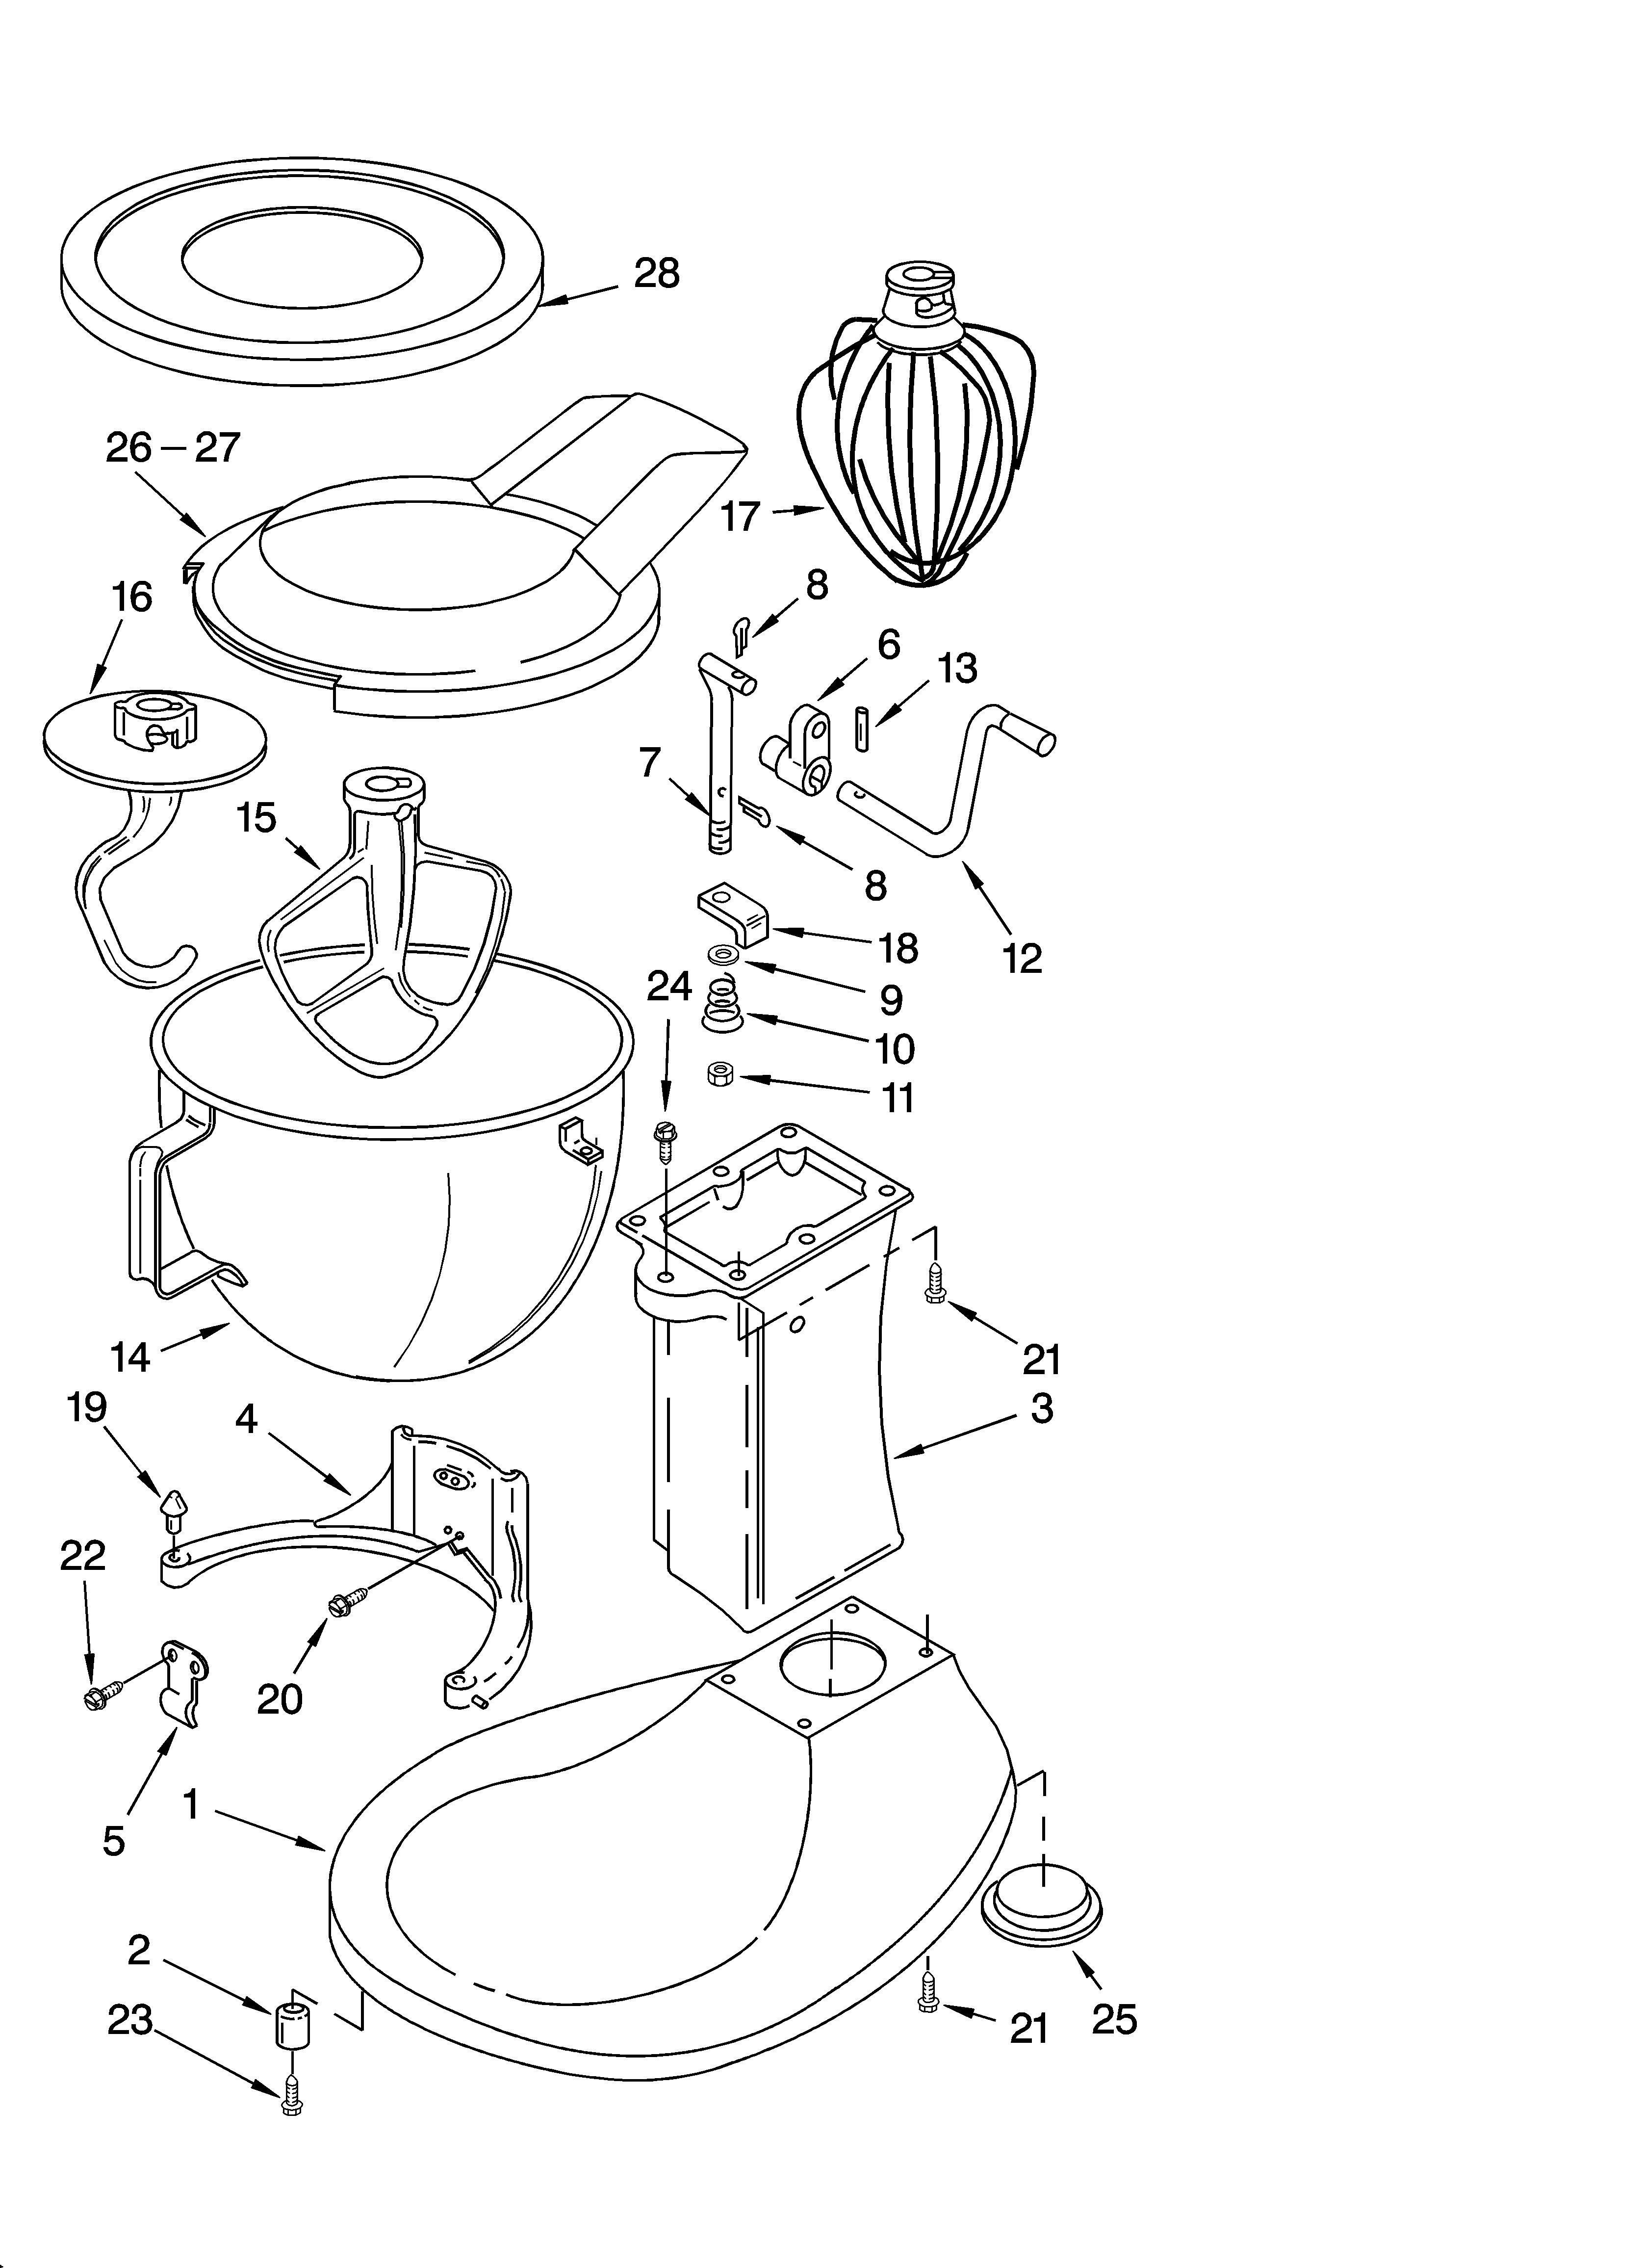 Base And Pedestal Unit Diagram Amp Parts List For Model K5ss